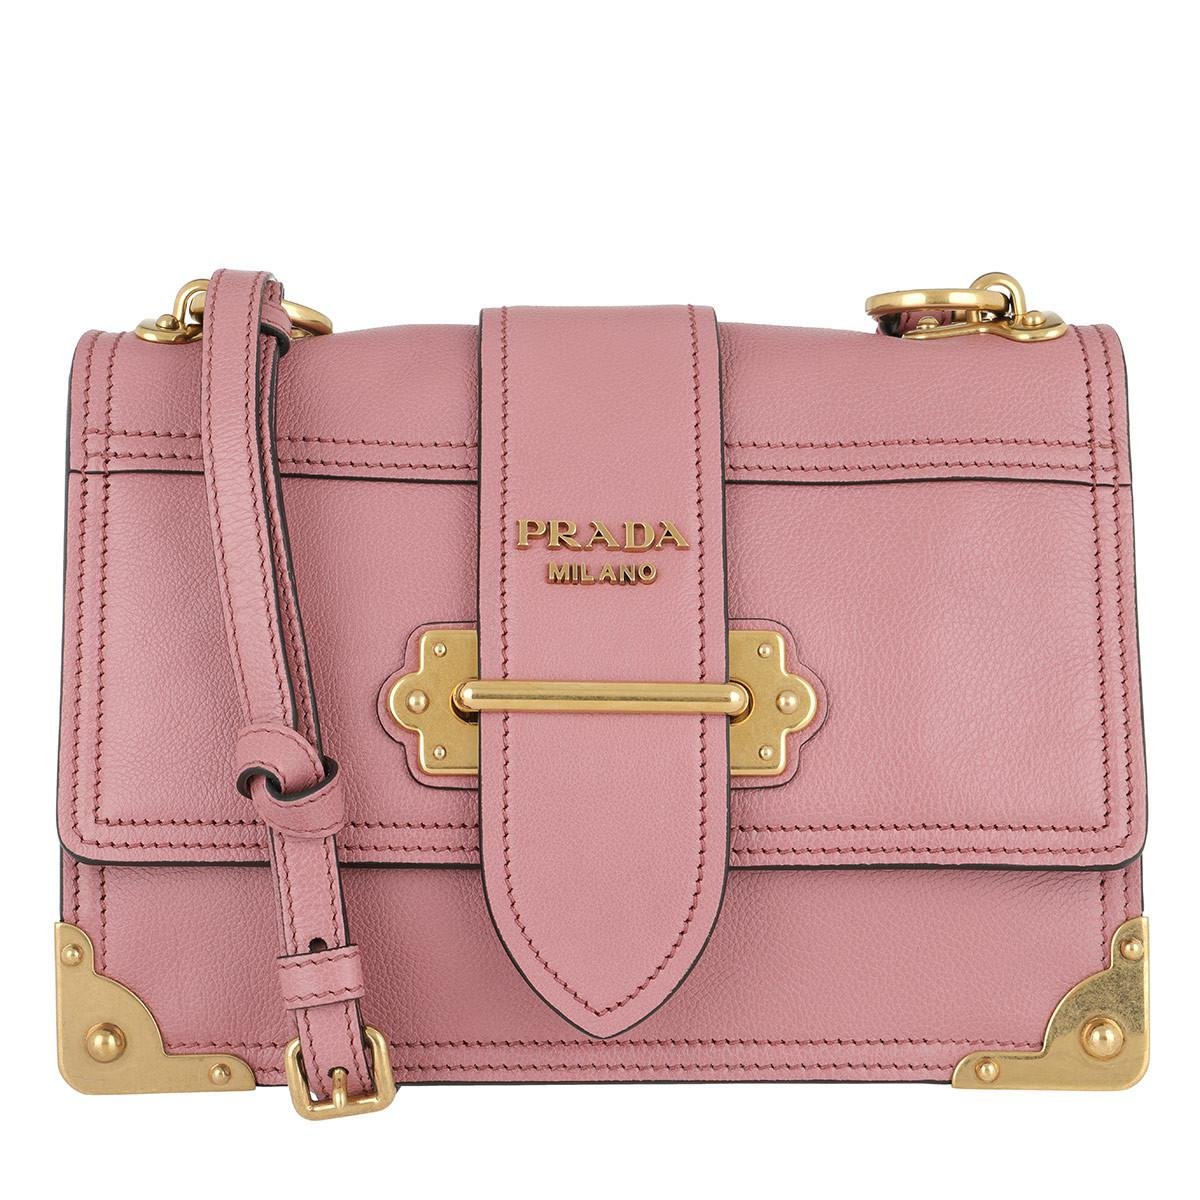 610df5588b3e Prada Glace Shoulder Bag Calf Leather Rose in Pink - Lyst